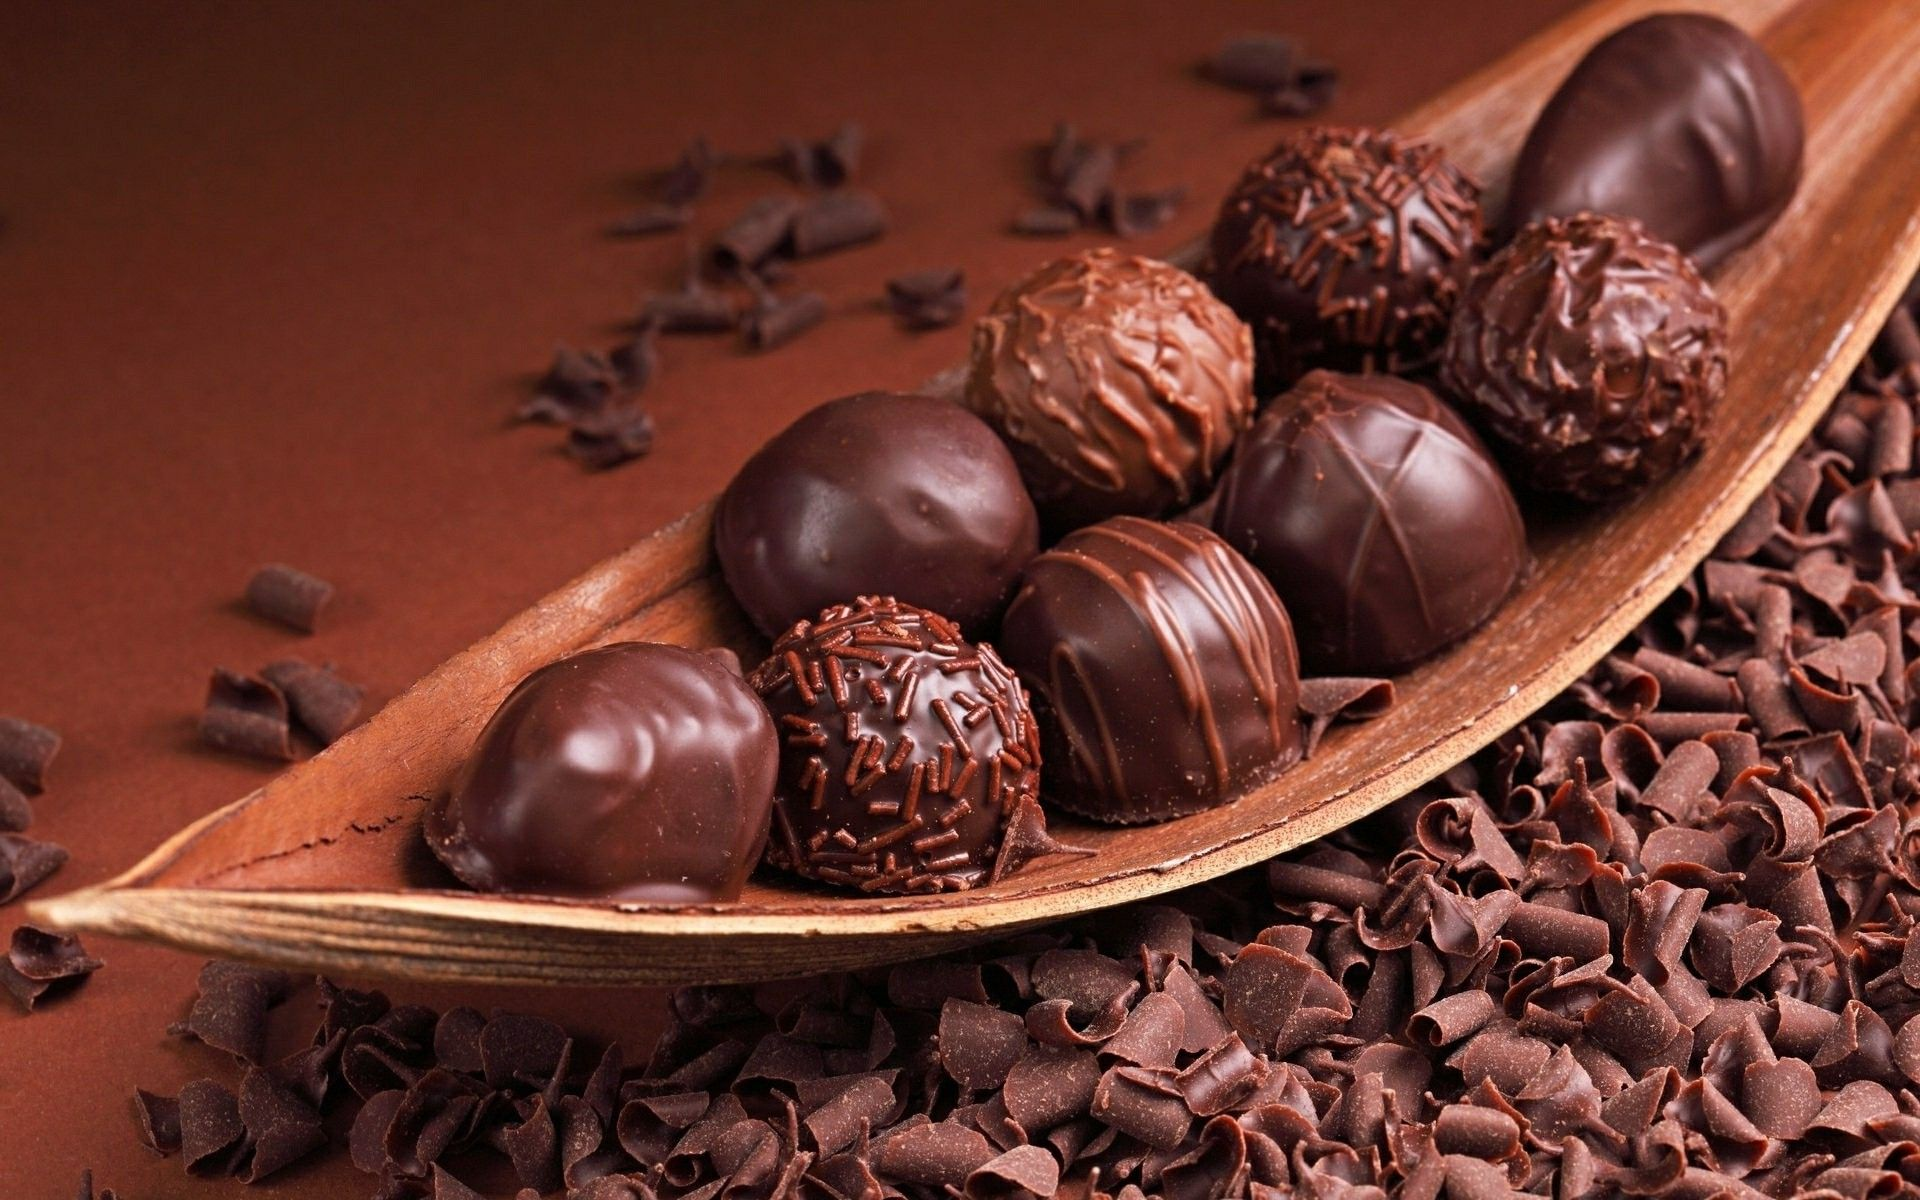 Fondos De Pantalla De Chocolates: Chocolat : Fond D'écran